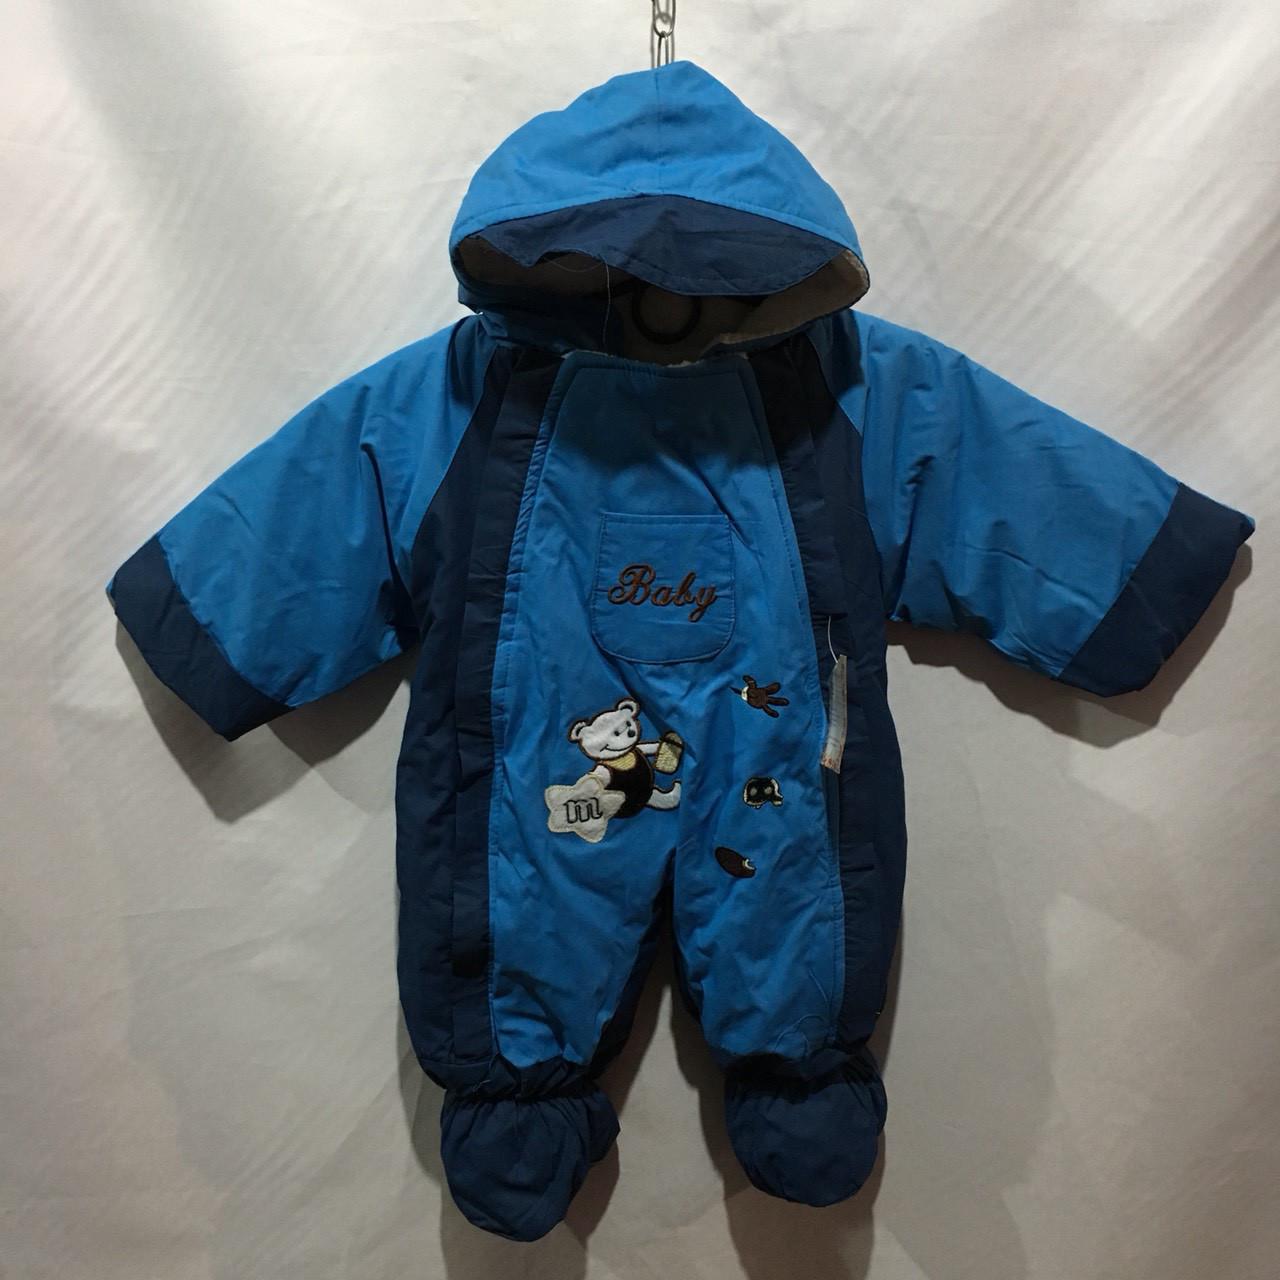 Детский тёплый комбинезон для мальчика 6 мес-1 года